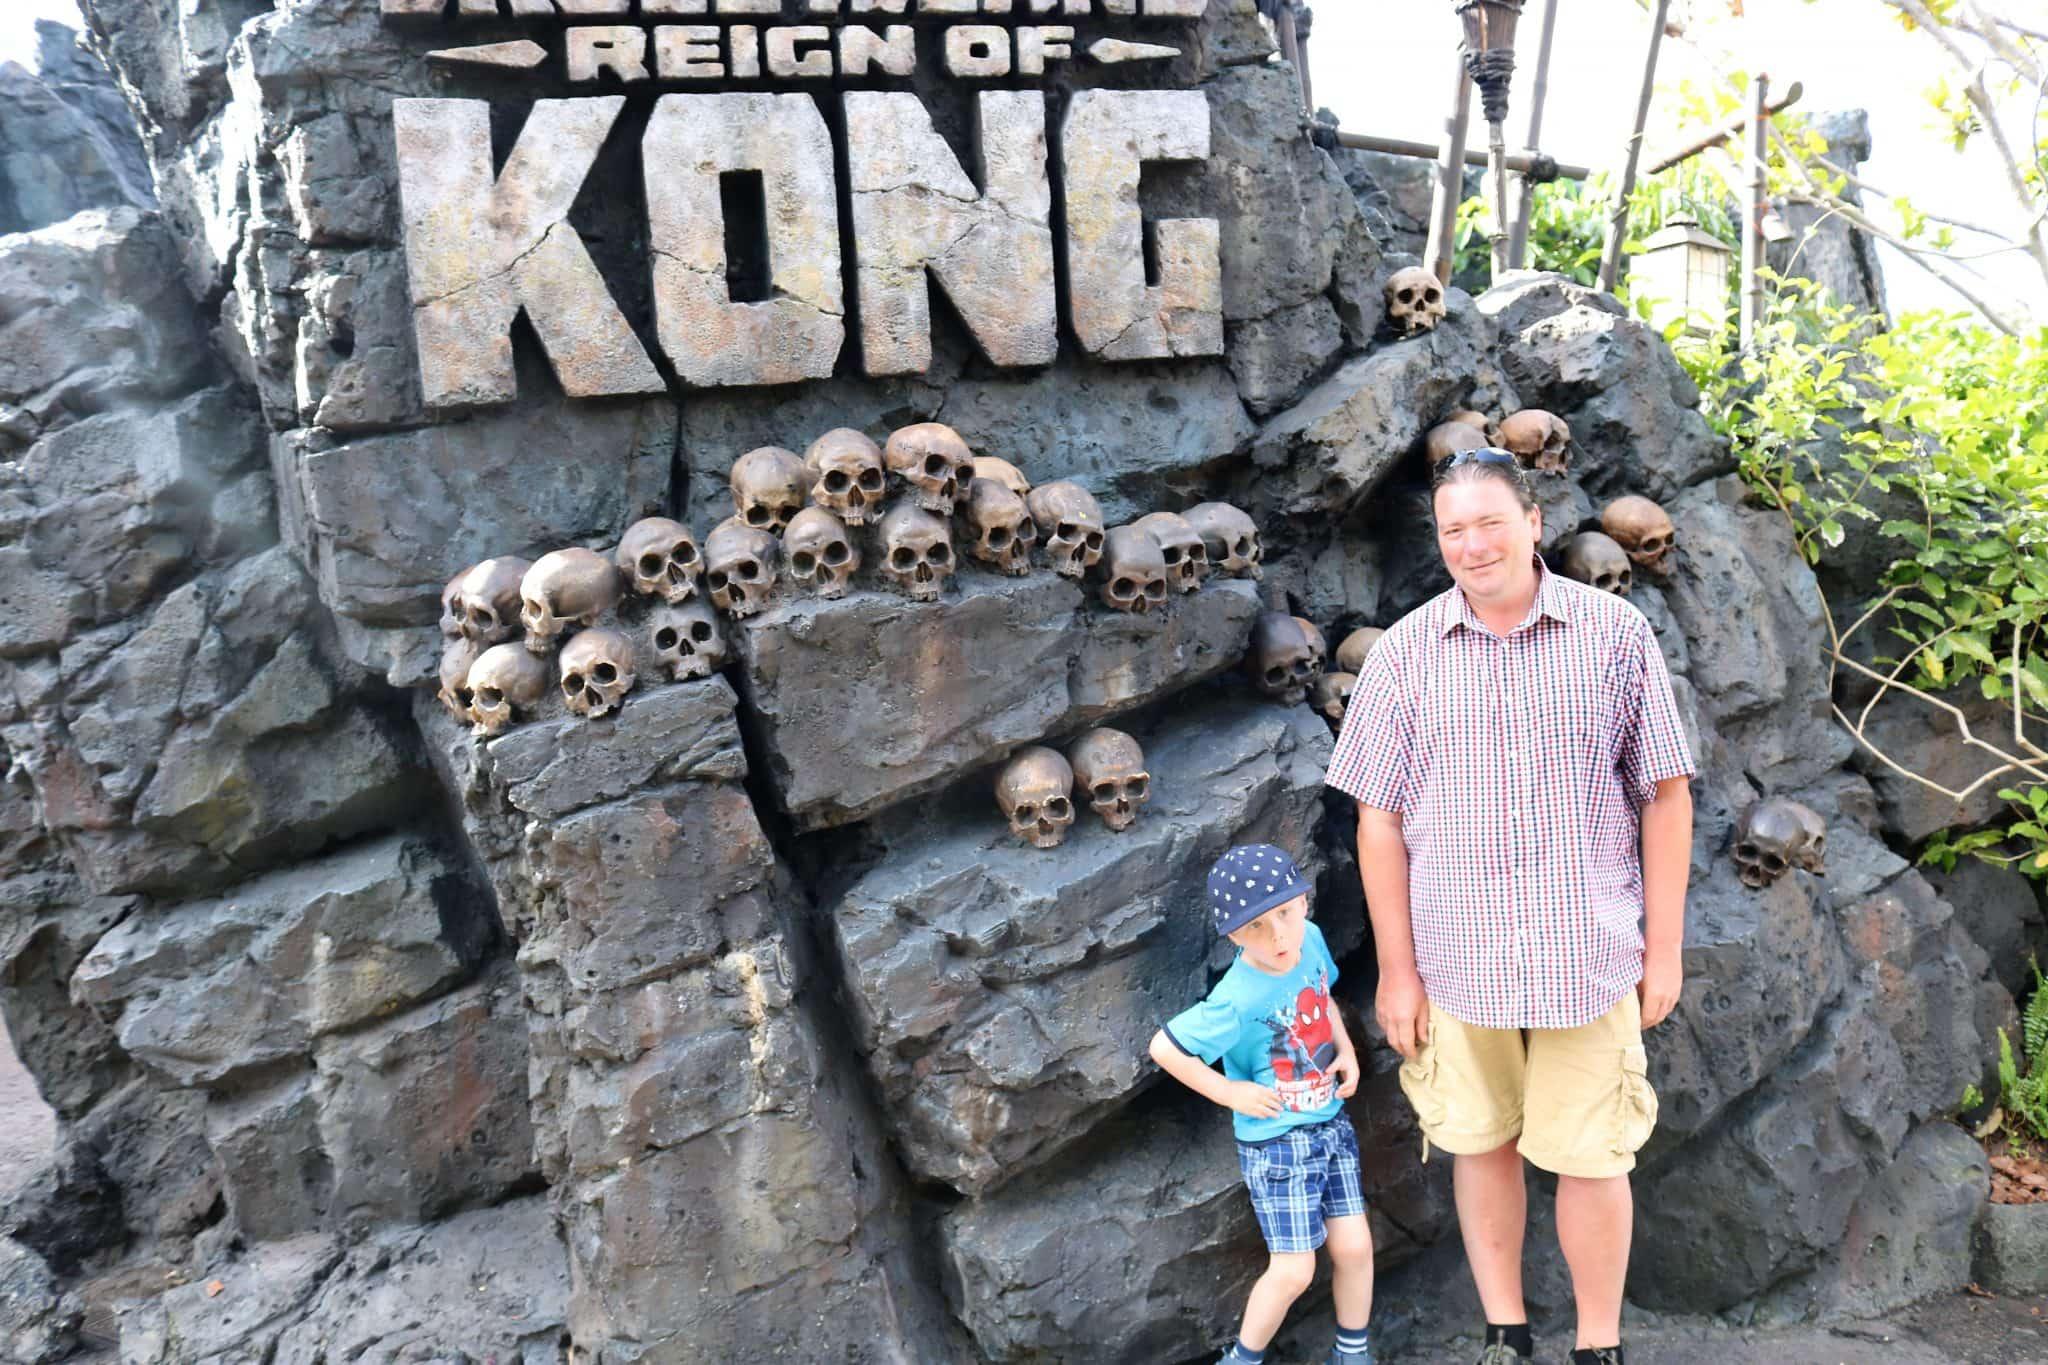 Skull Island, Reign of Kong